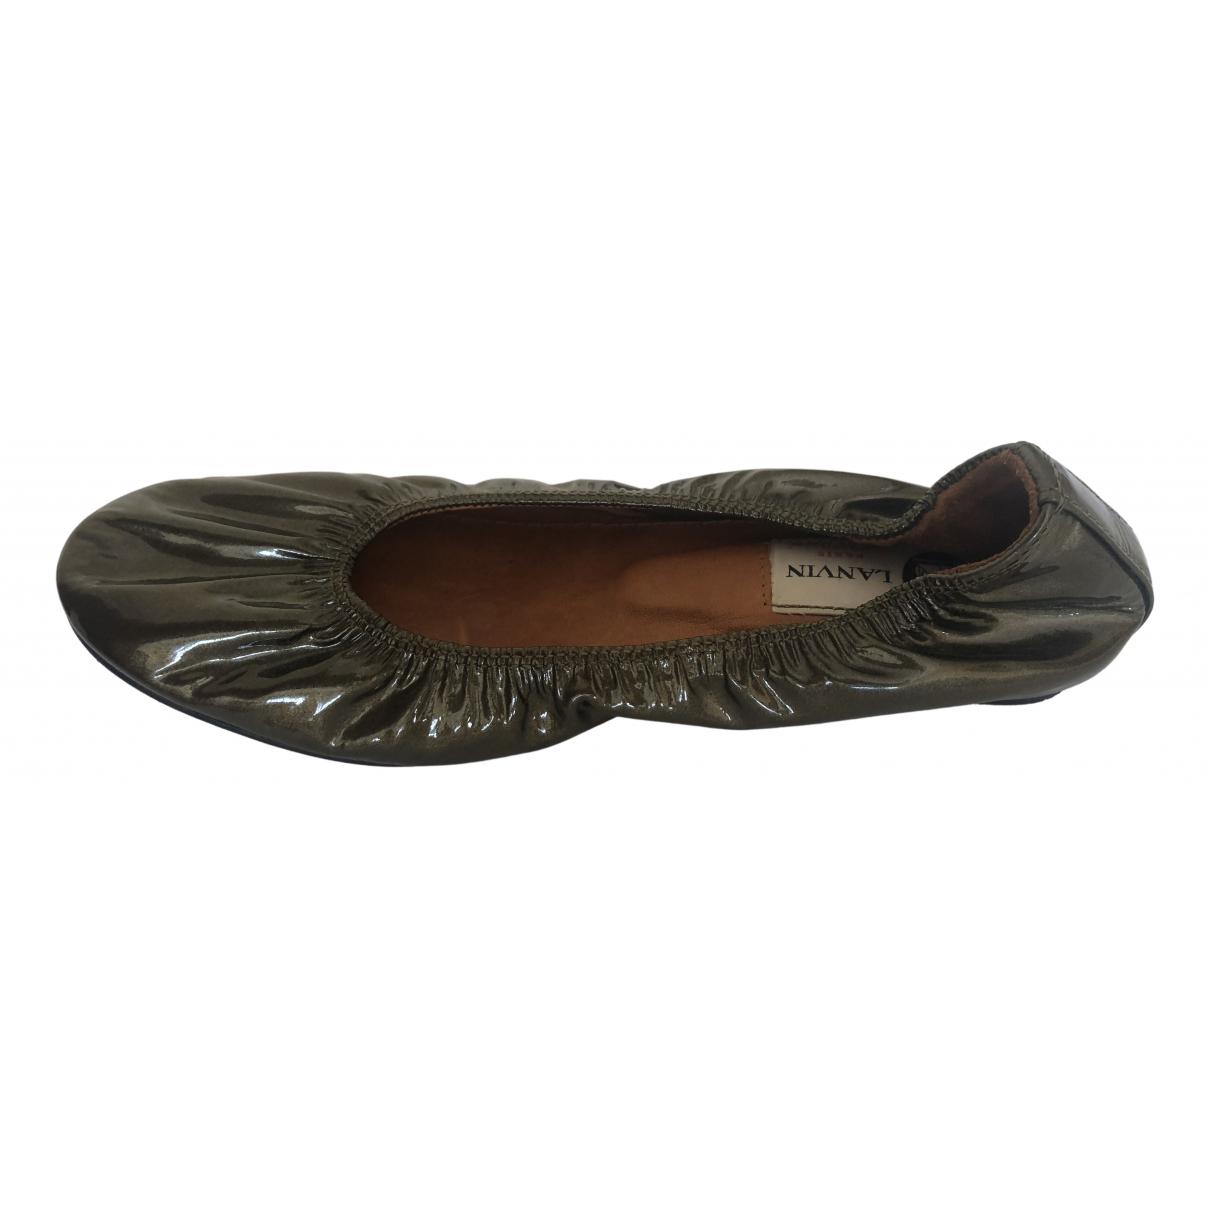 Lanvin \N Khaki Patent leather Ballet flats for Women 37 EU